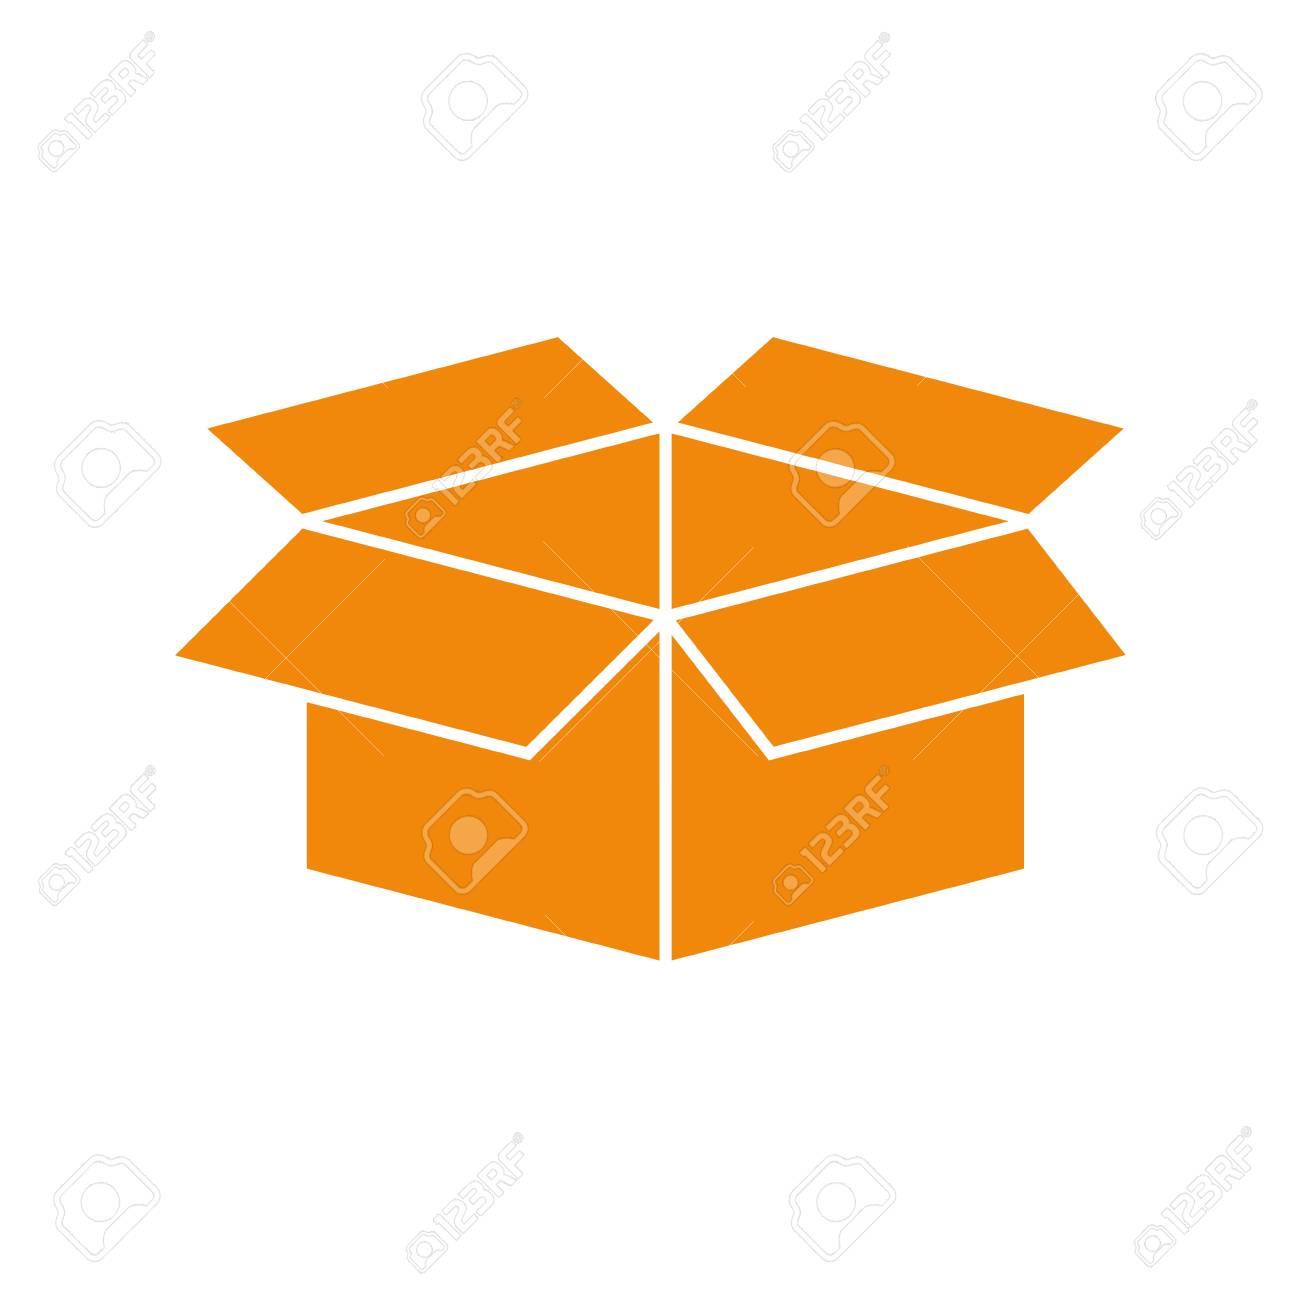 Open Box Symbol Icon Vector Illustration Graphic Design Royalty Free